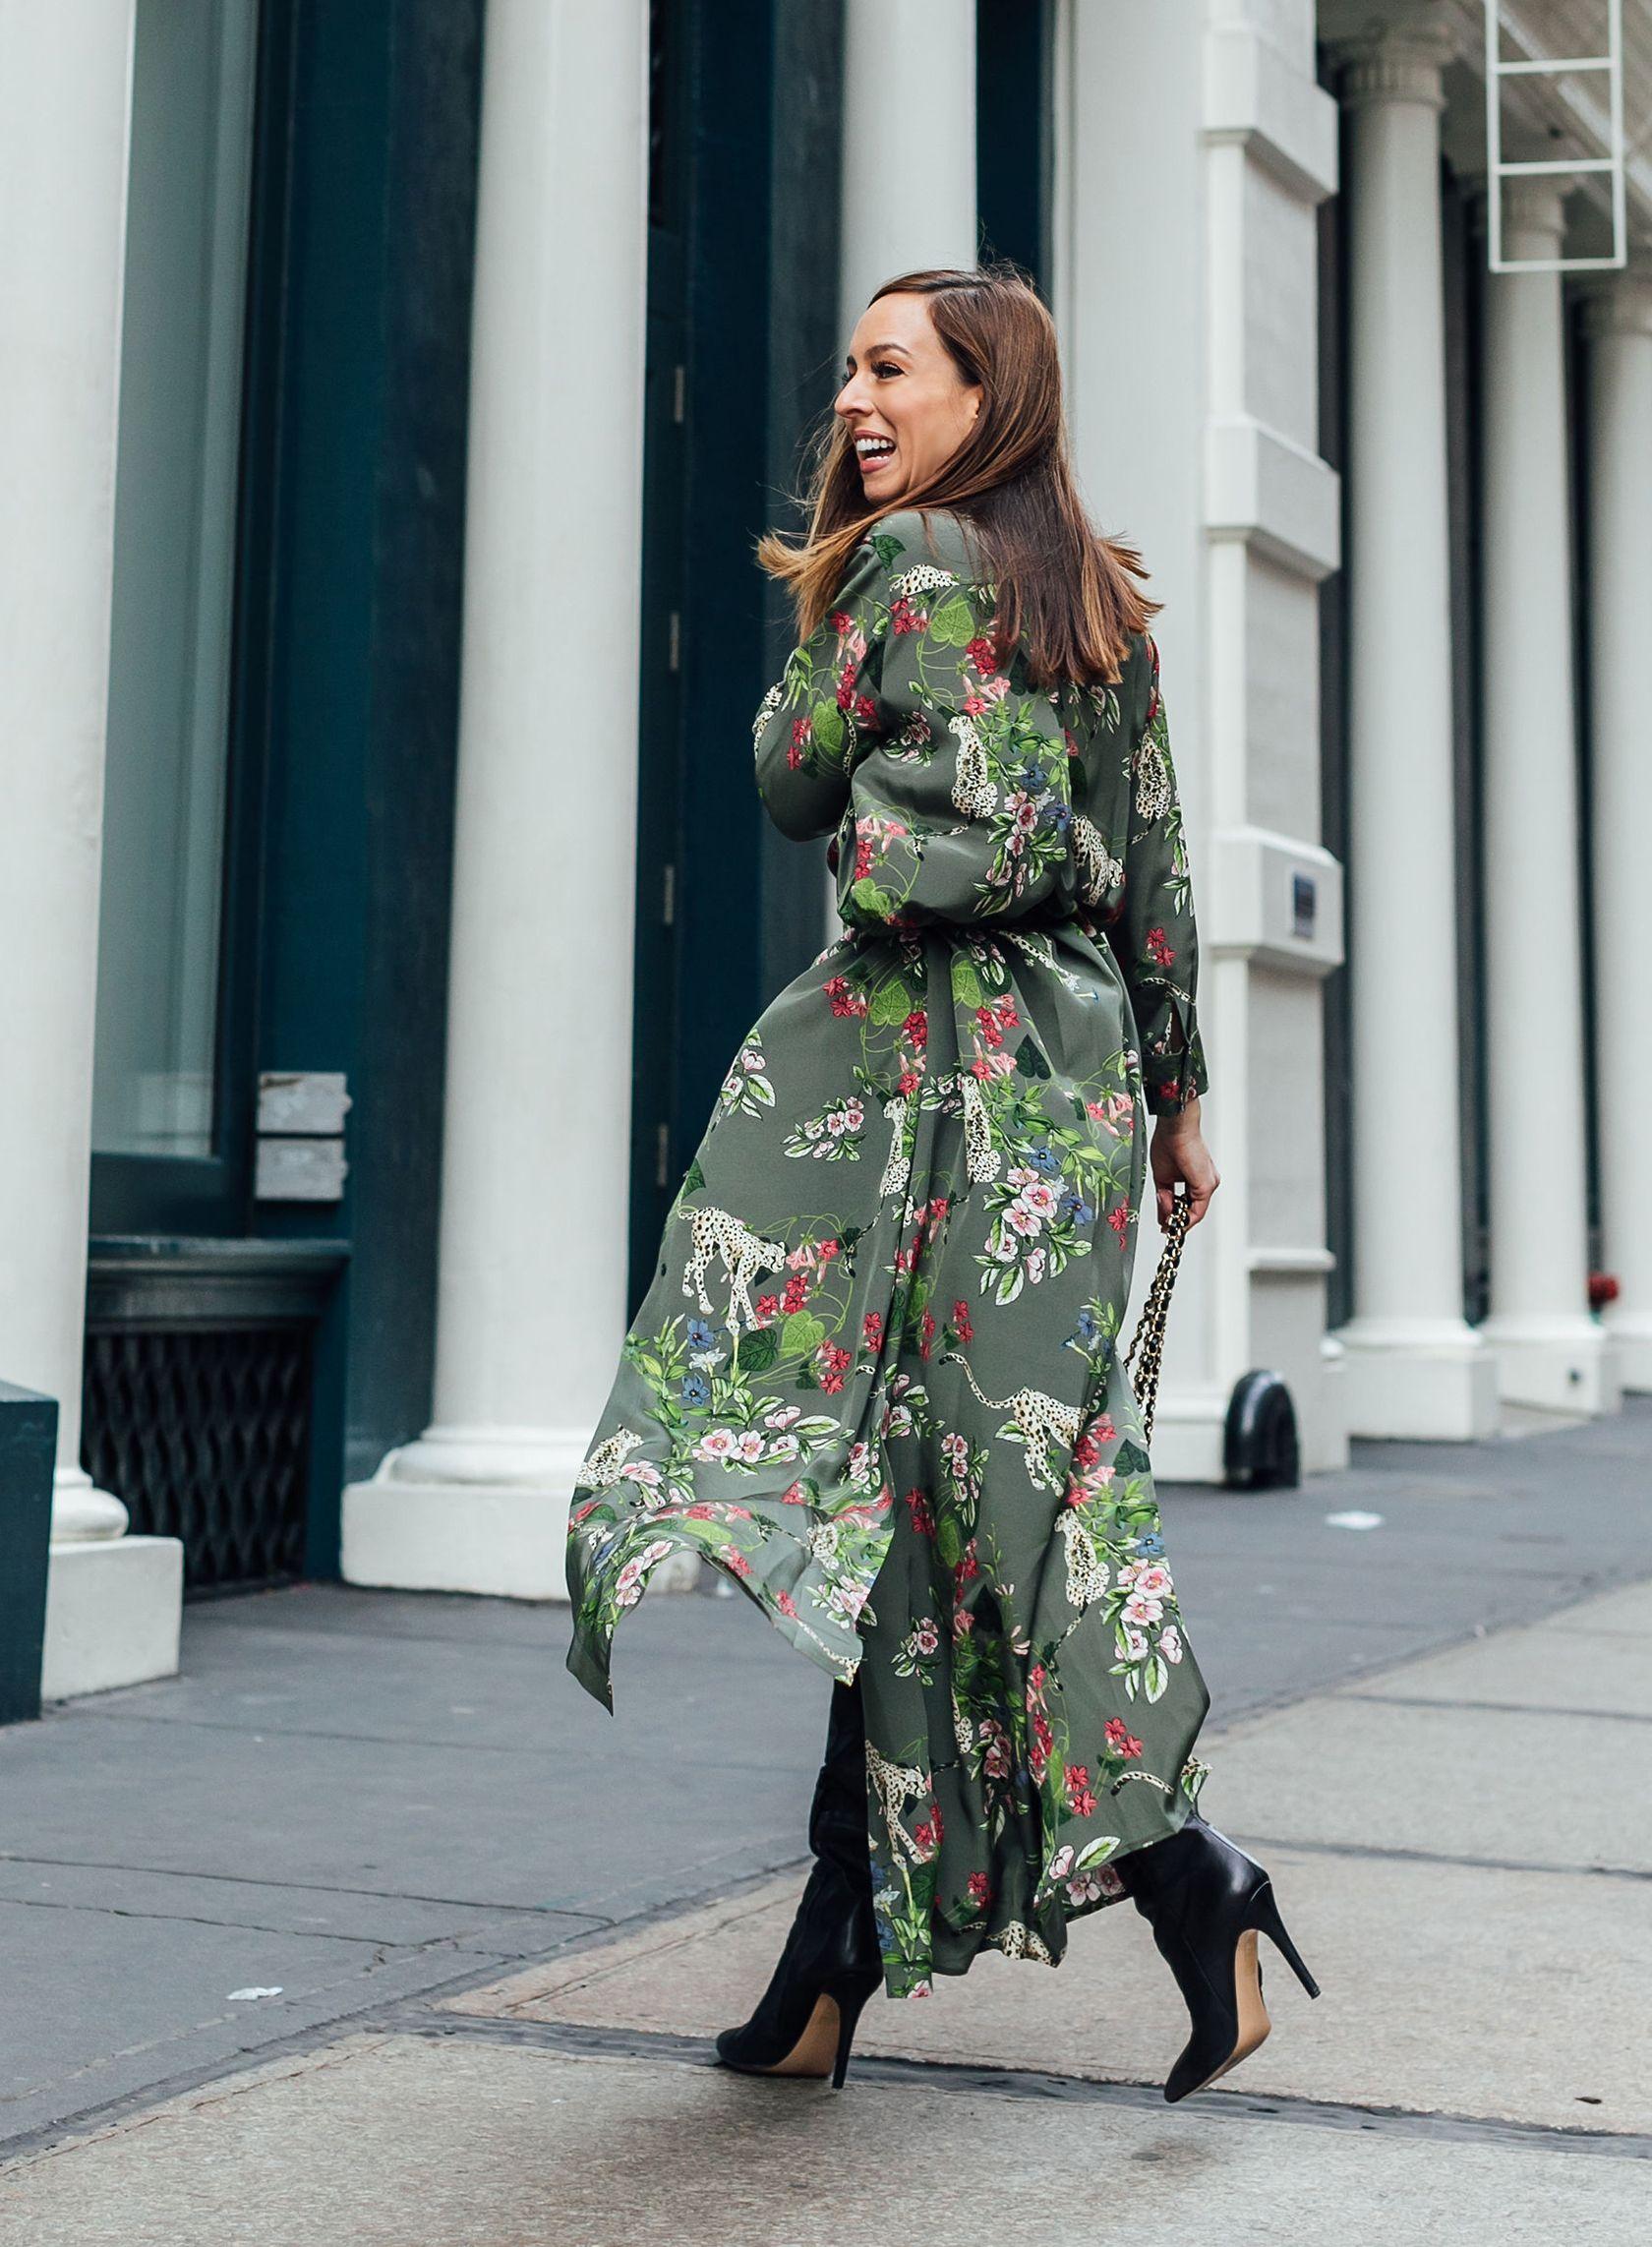 9a8a06f96 Sydne Style wears l'agence green jungle print floral dress at new york  fashion week #florals #leopard #prints #green #shirtdress #maxidress  @sydnesummer